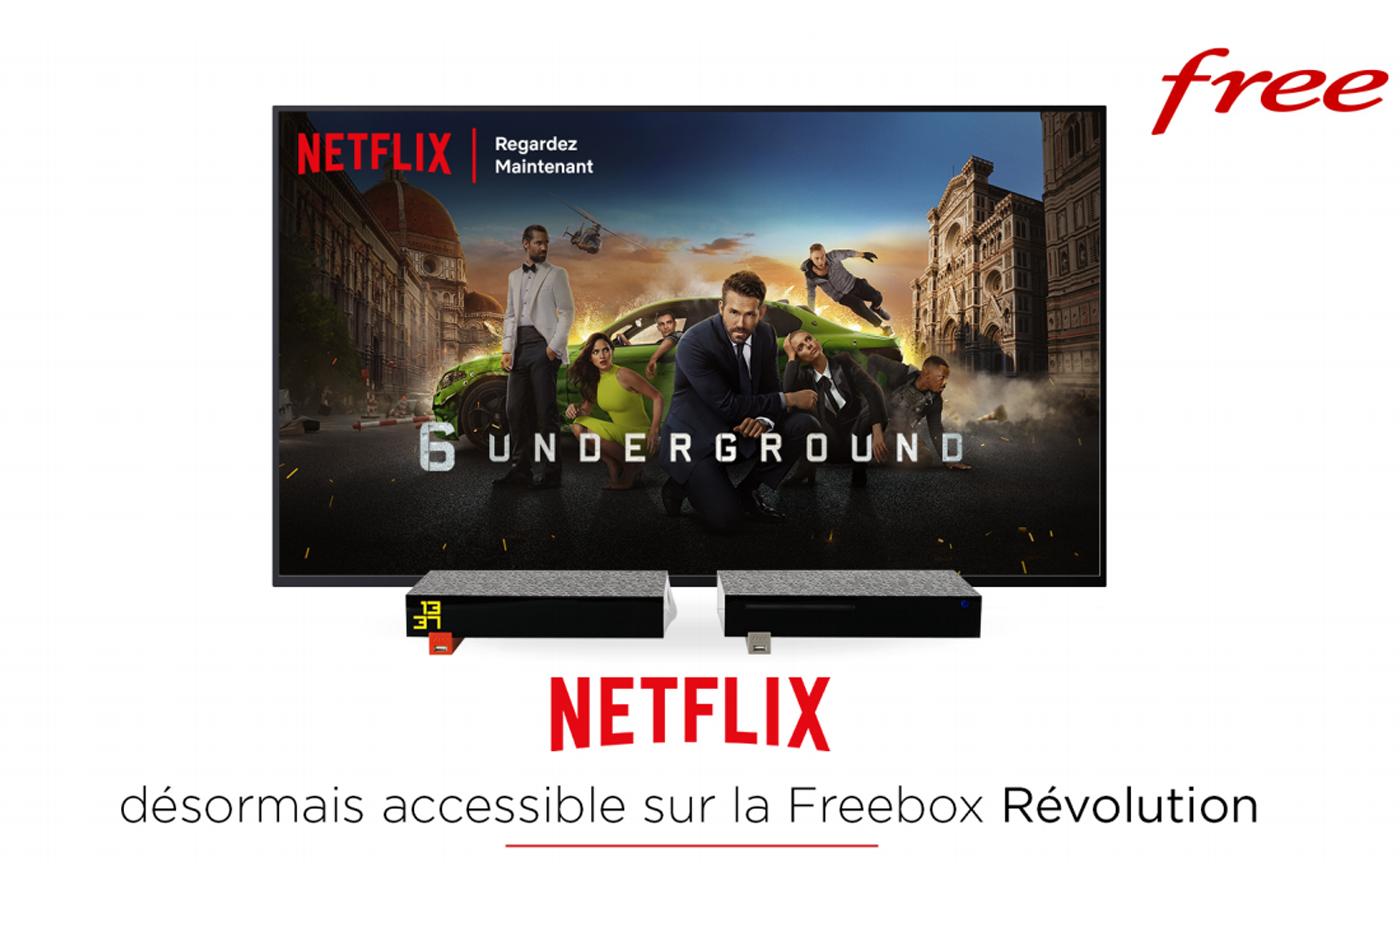 Netflix enfin sur la Freebox Revolution